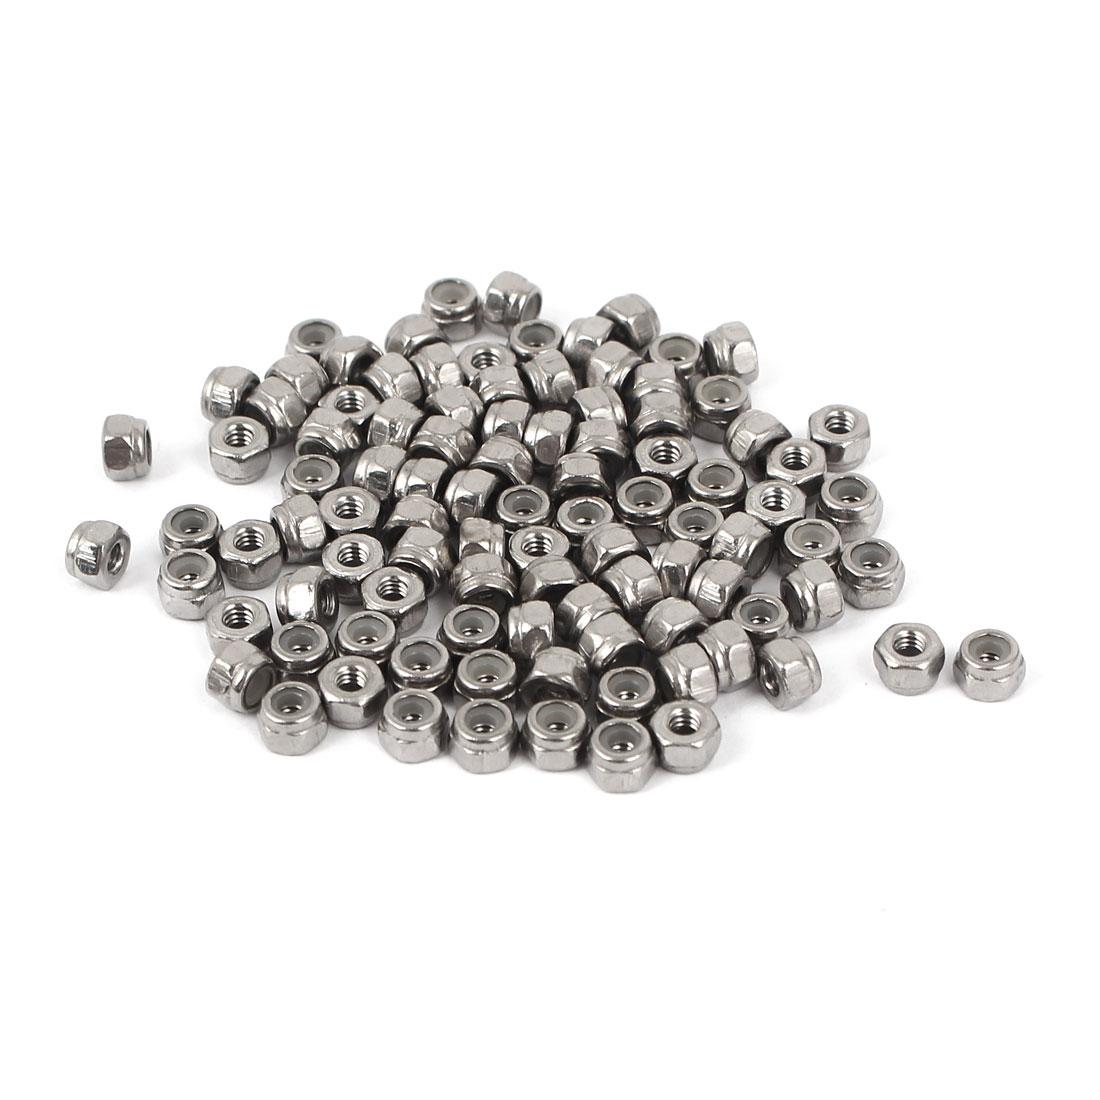 M2 304 Stainless Steel Nylock Self-Locking Nylon Insert Hex Lock Nuts 100pcs